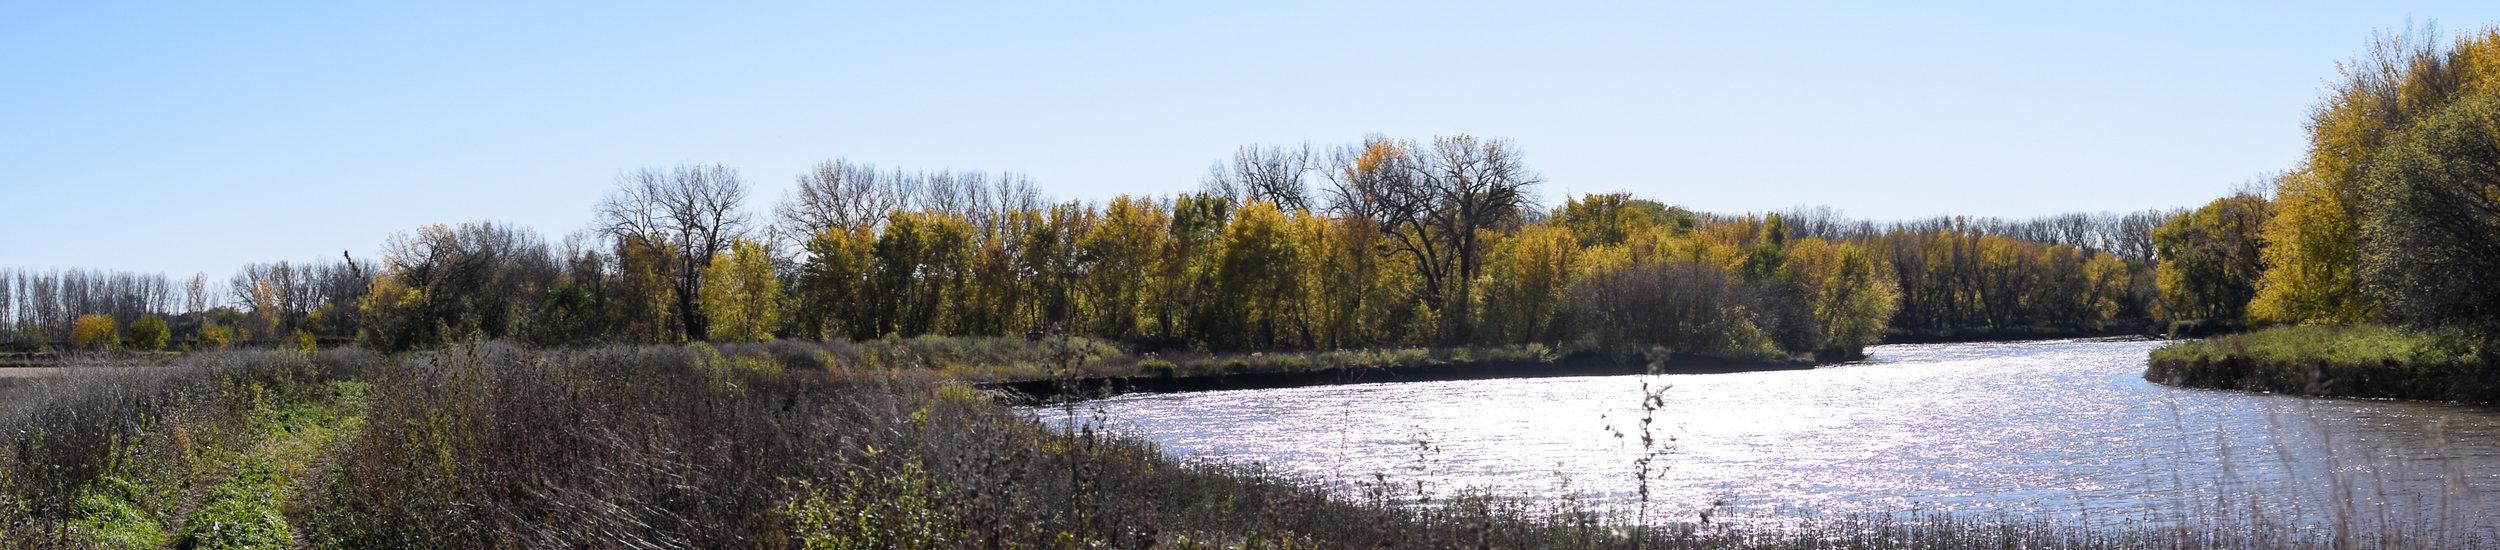 KAYAK102217.14 Big Sioux River Adventures Akron Iowa.jpg